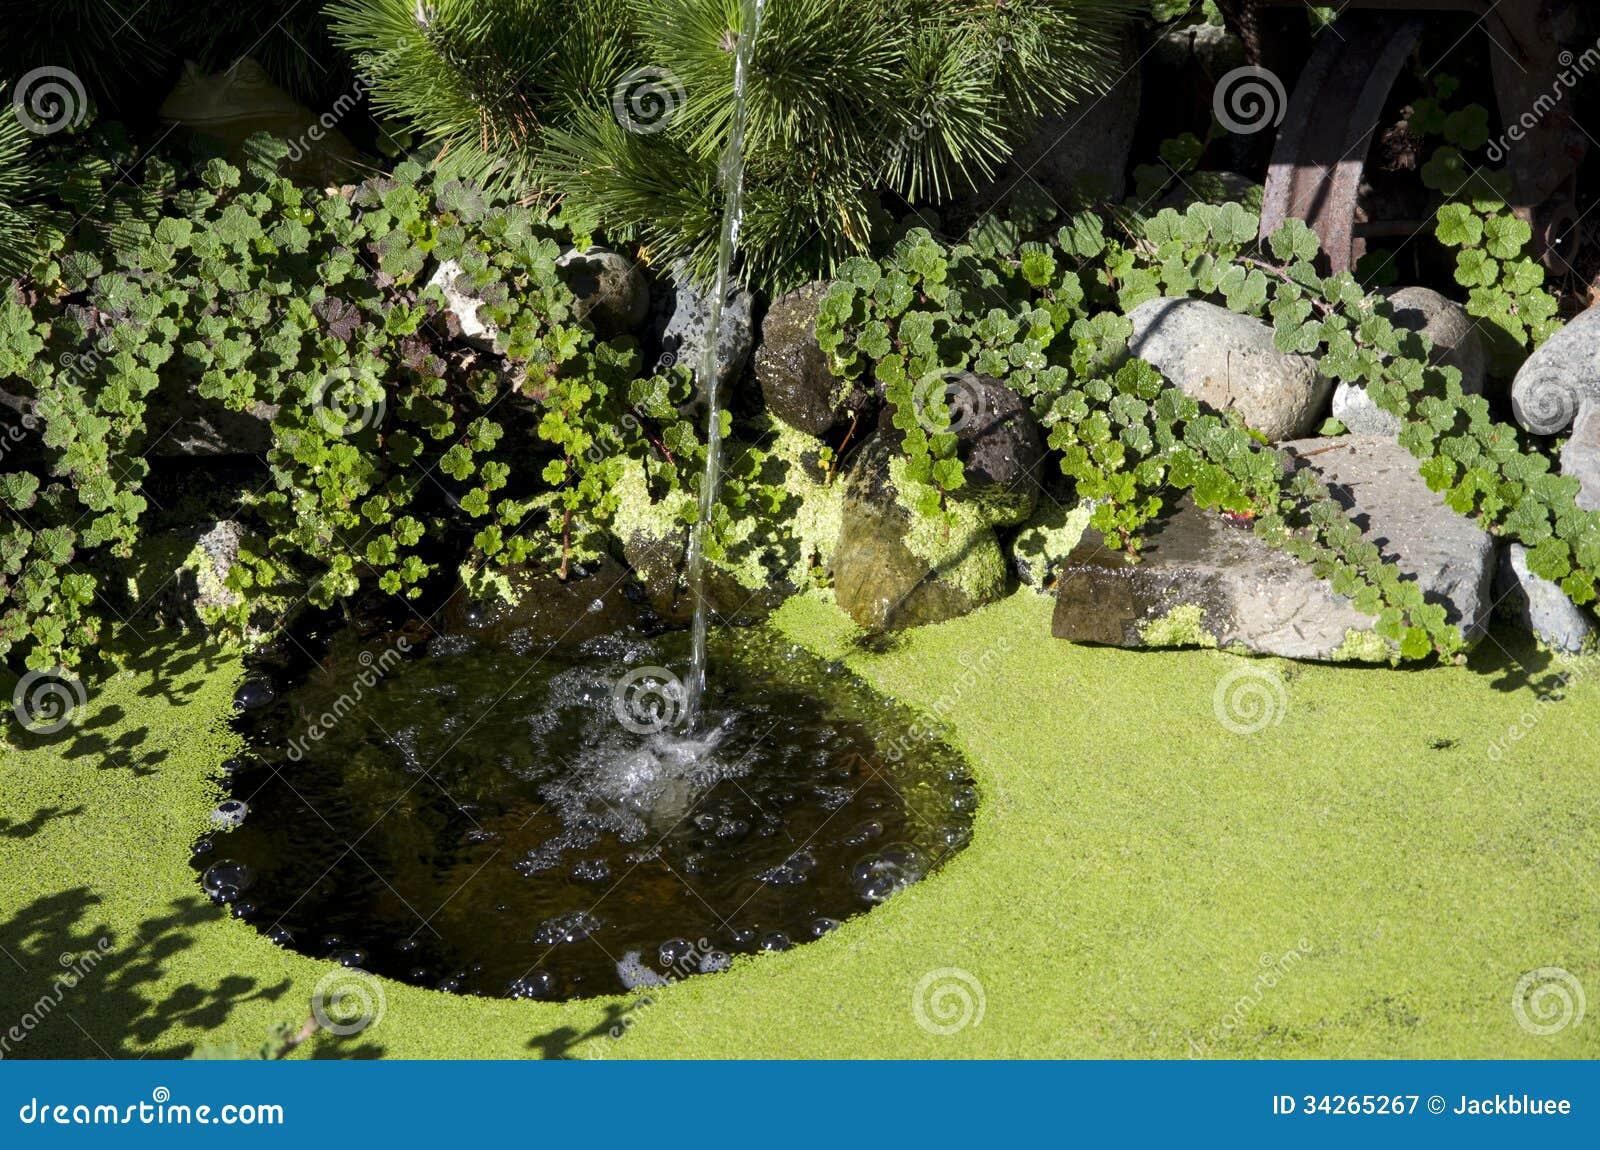 Garden stock image image of weed gardening pond for Garden pond design software free download